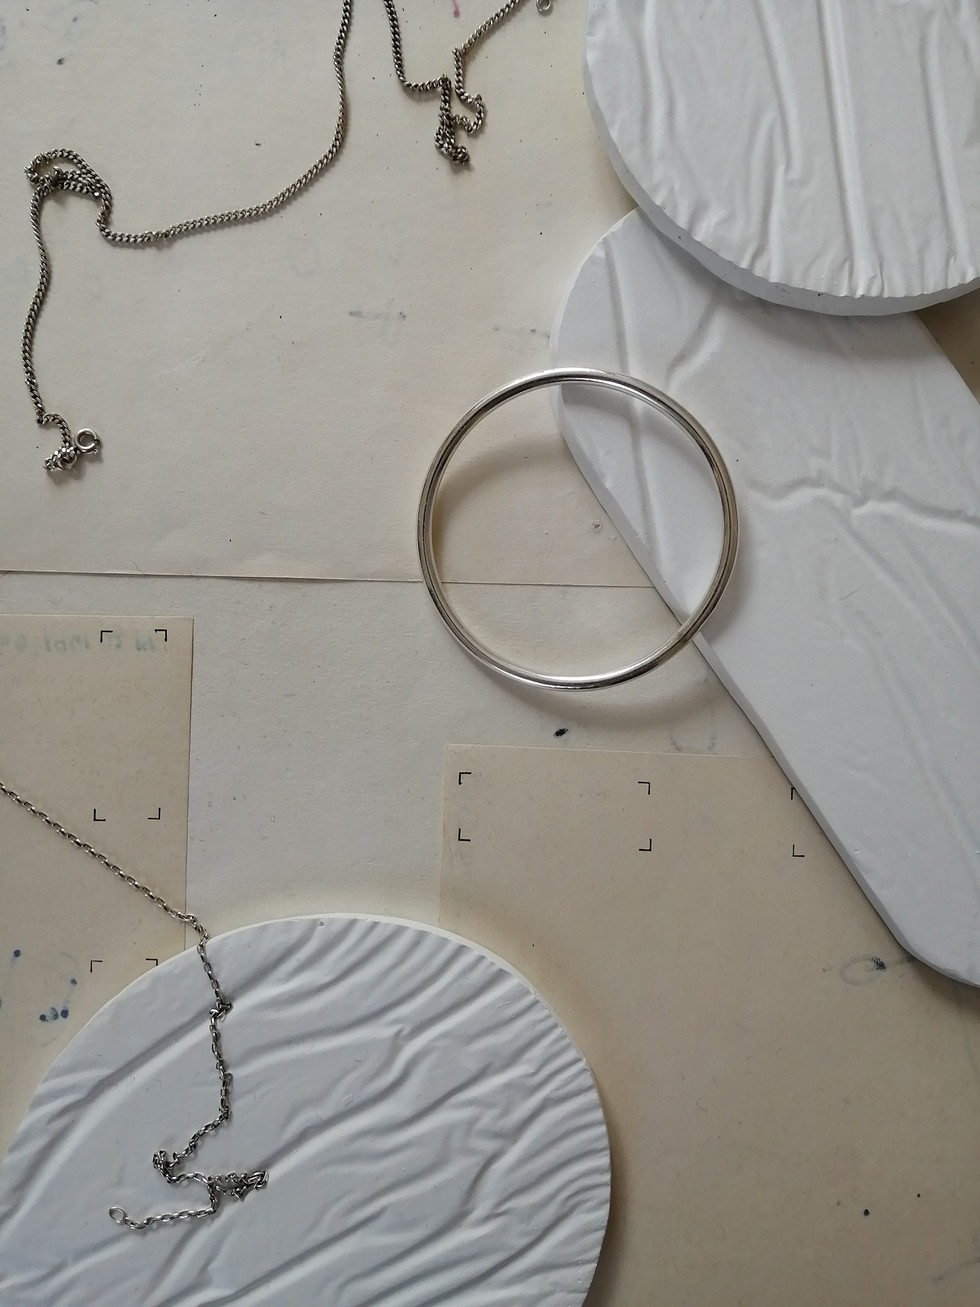 studio-grey-on-grey-crease-1-1.jpg